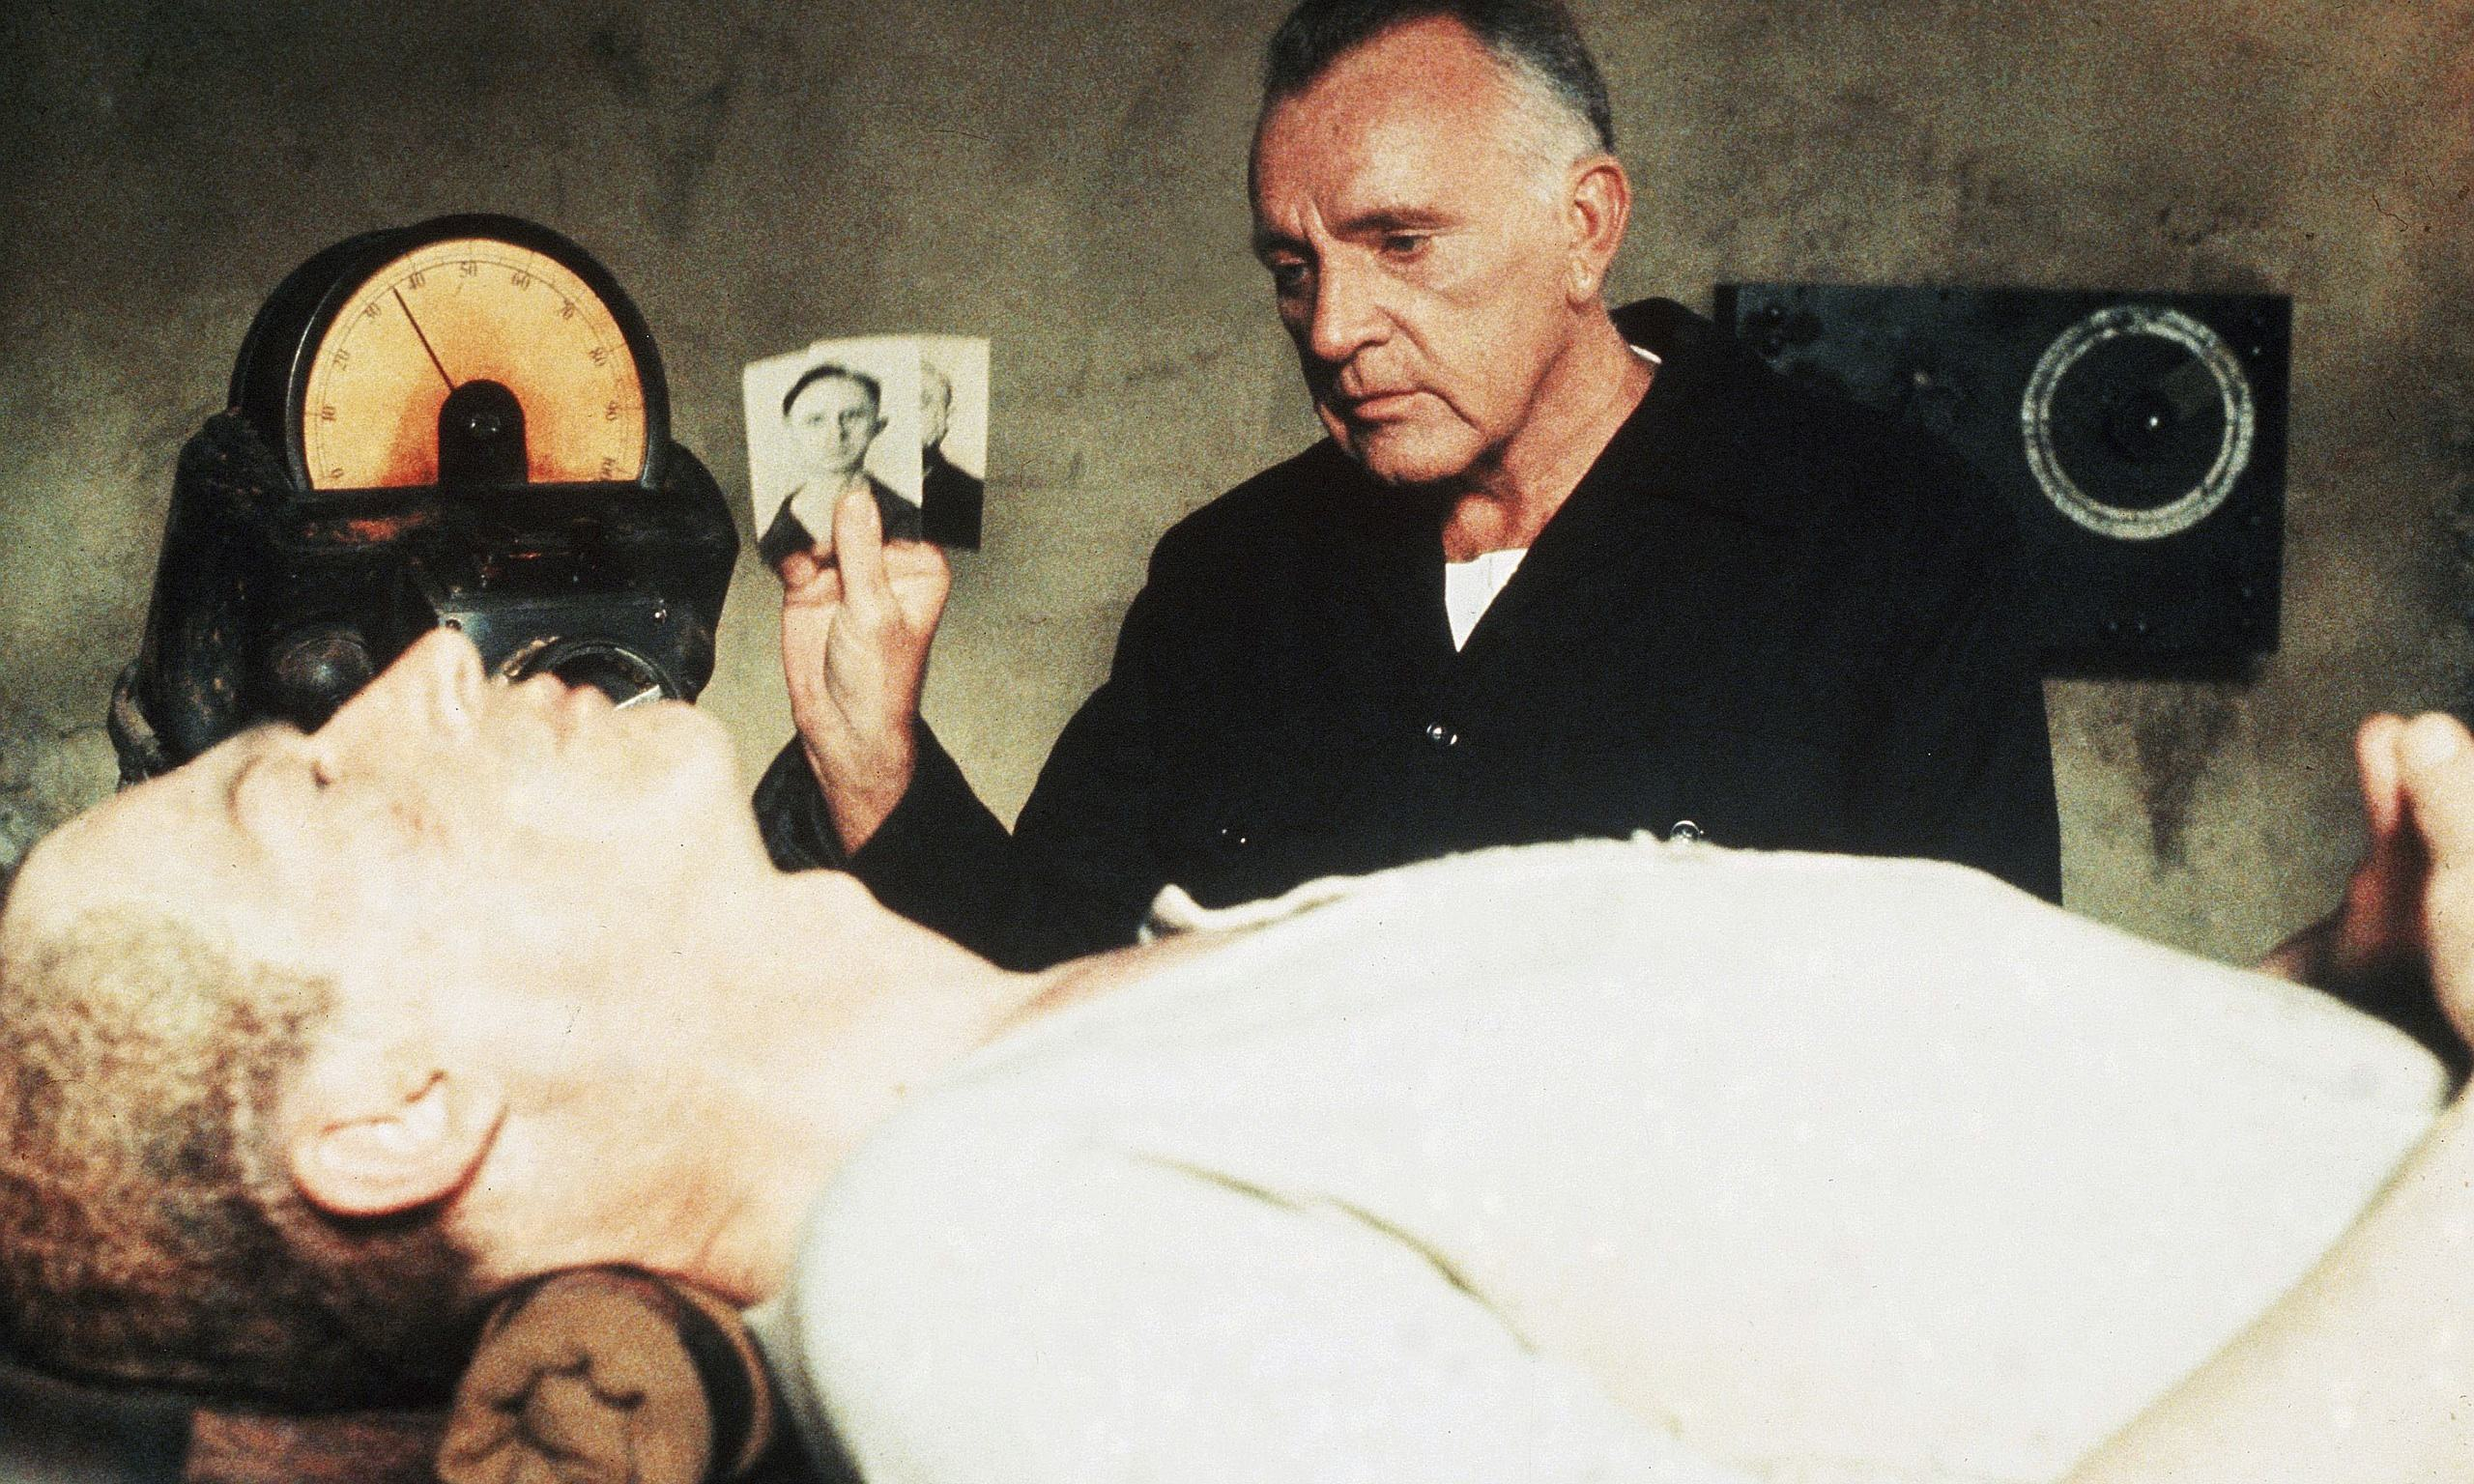 1984: the romantic film. Love the idea? | Books | The Guardian